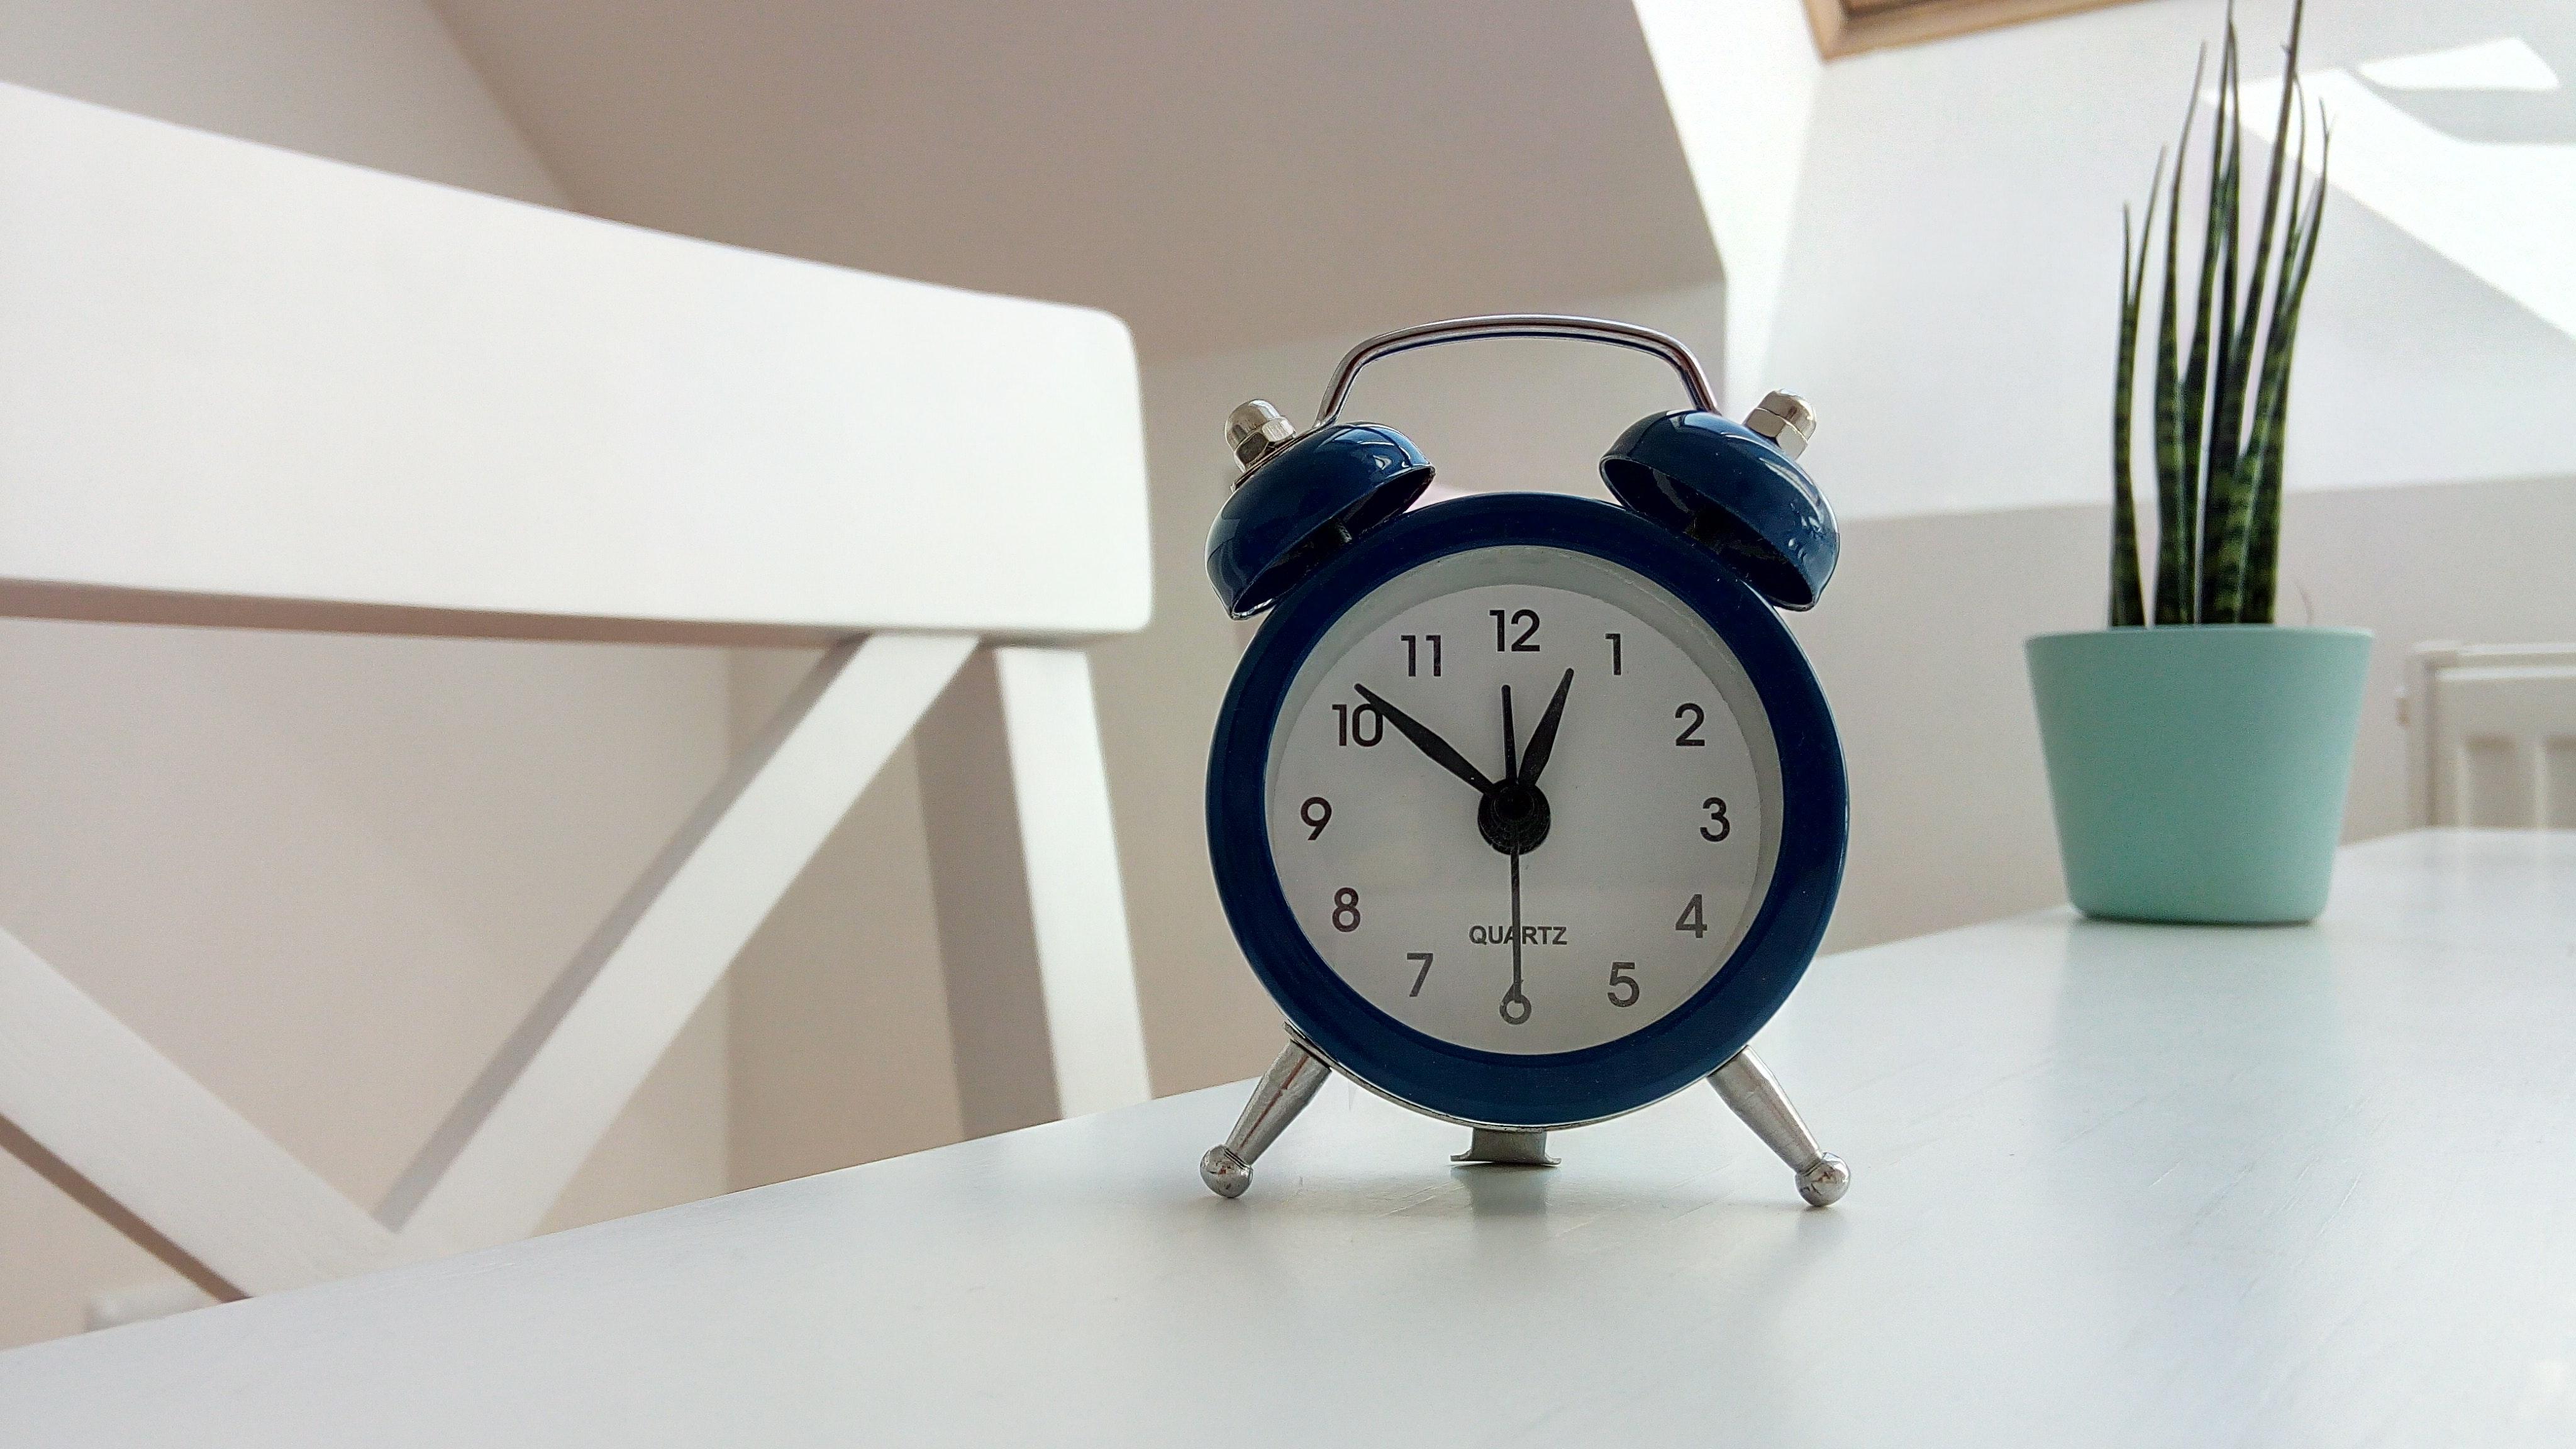 Free Images : alarm clock, classic, count, countdown